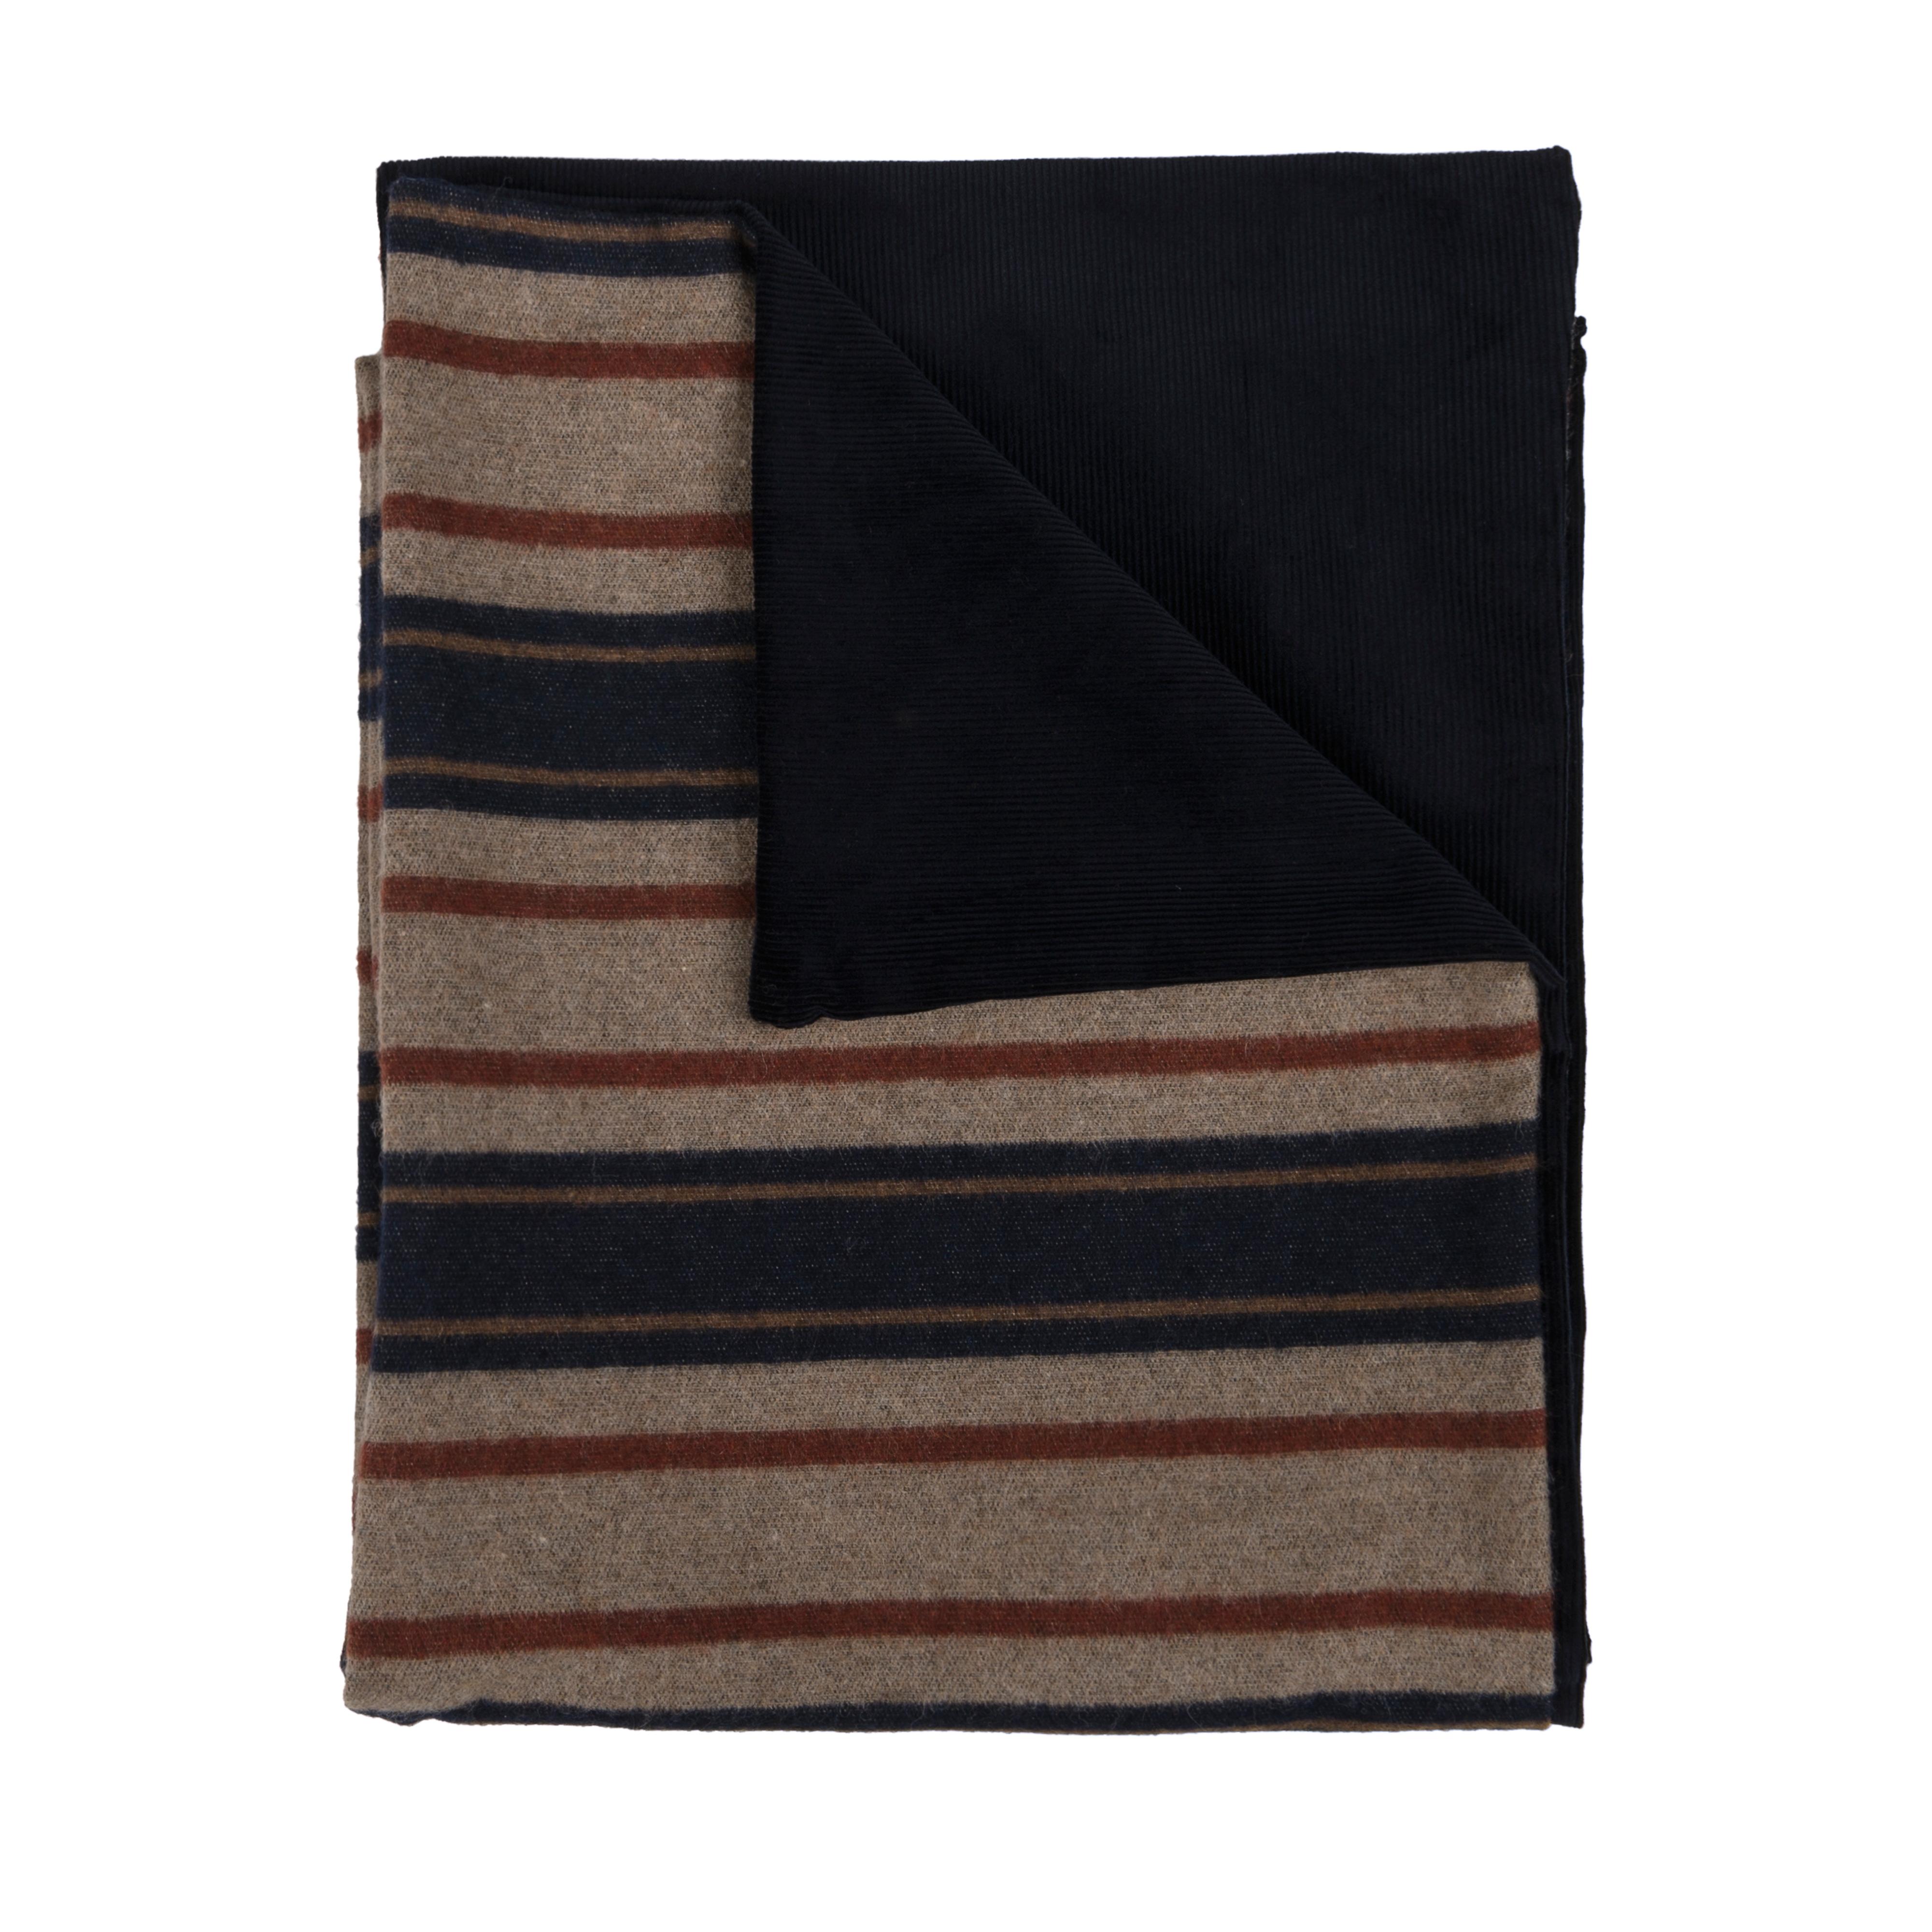 Corduroy Scarf Navy/Blanket Lined